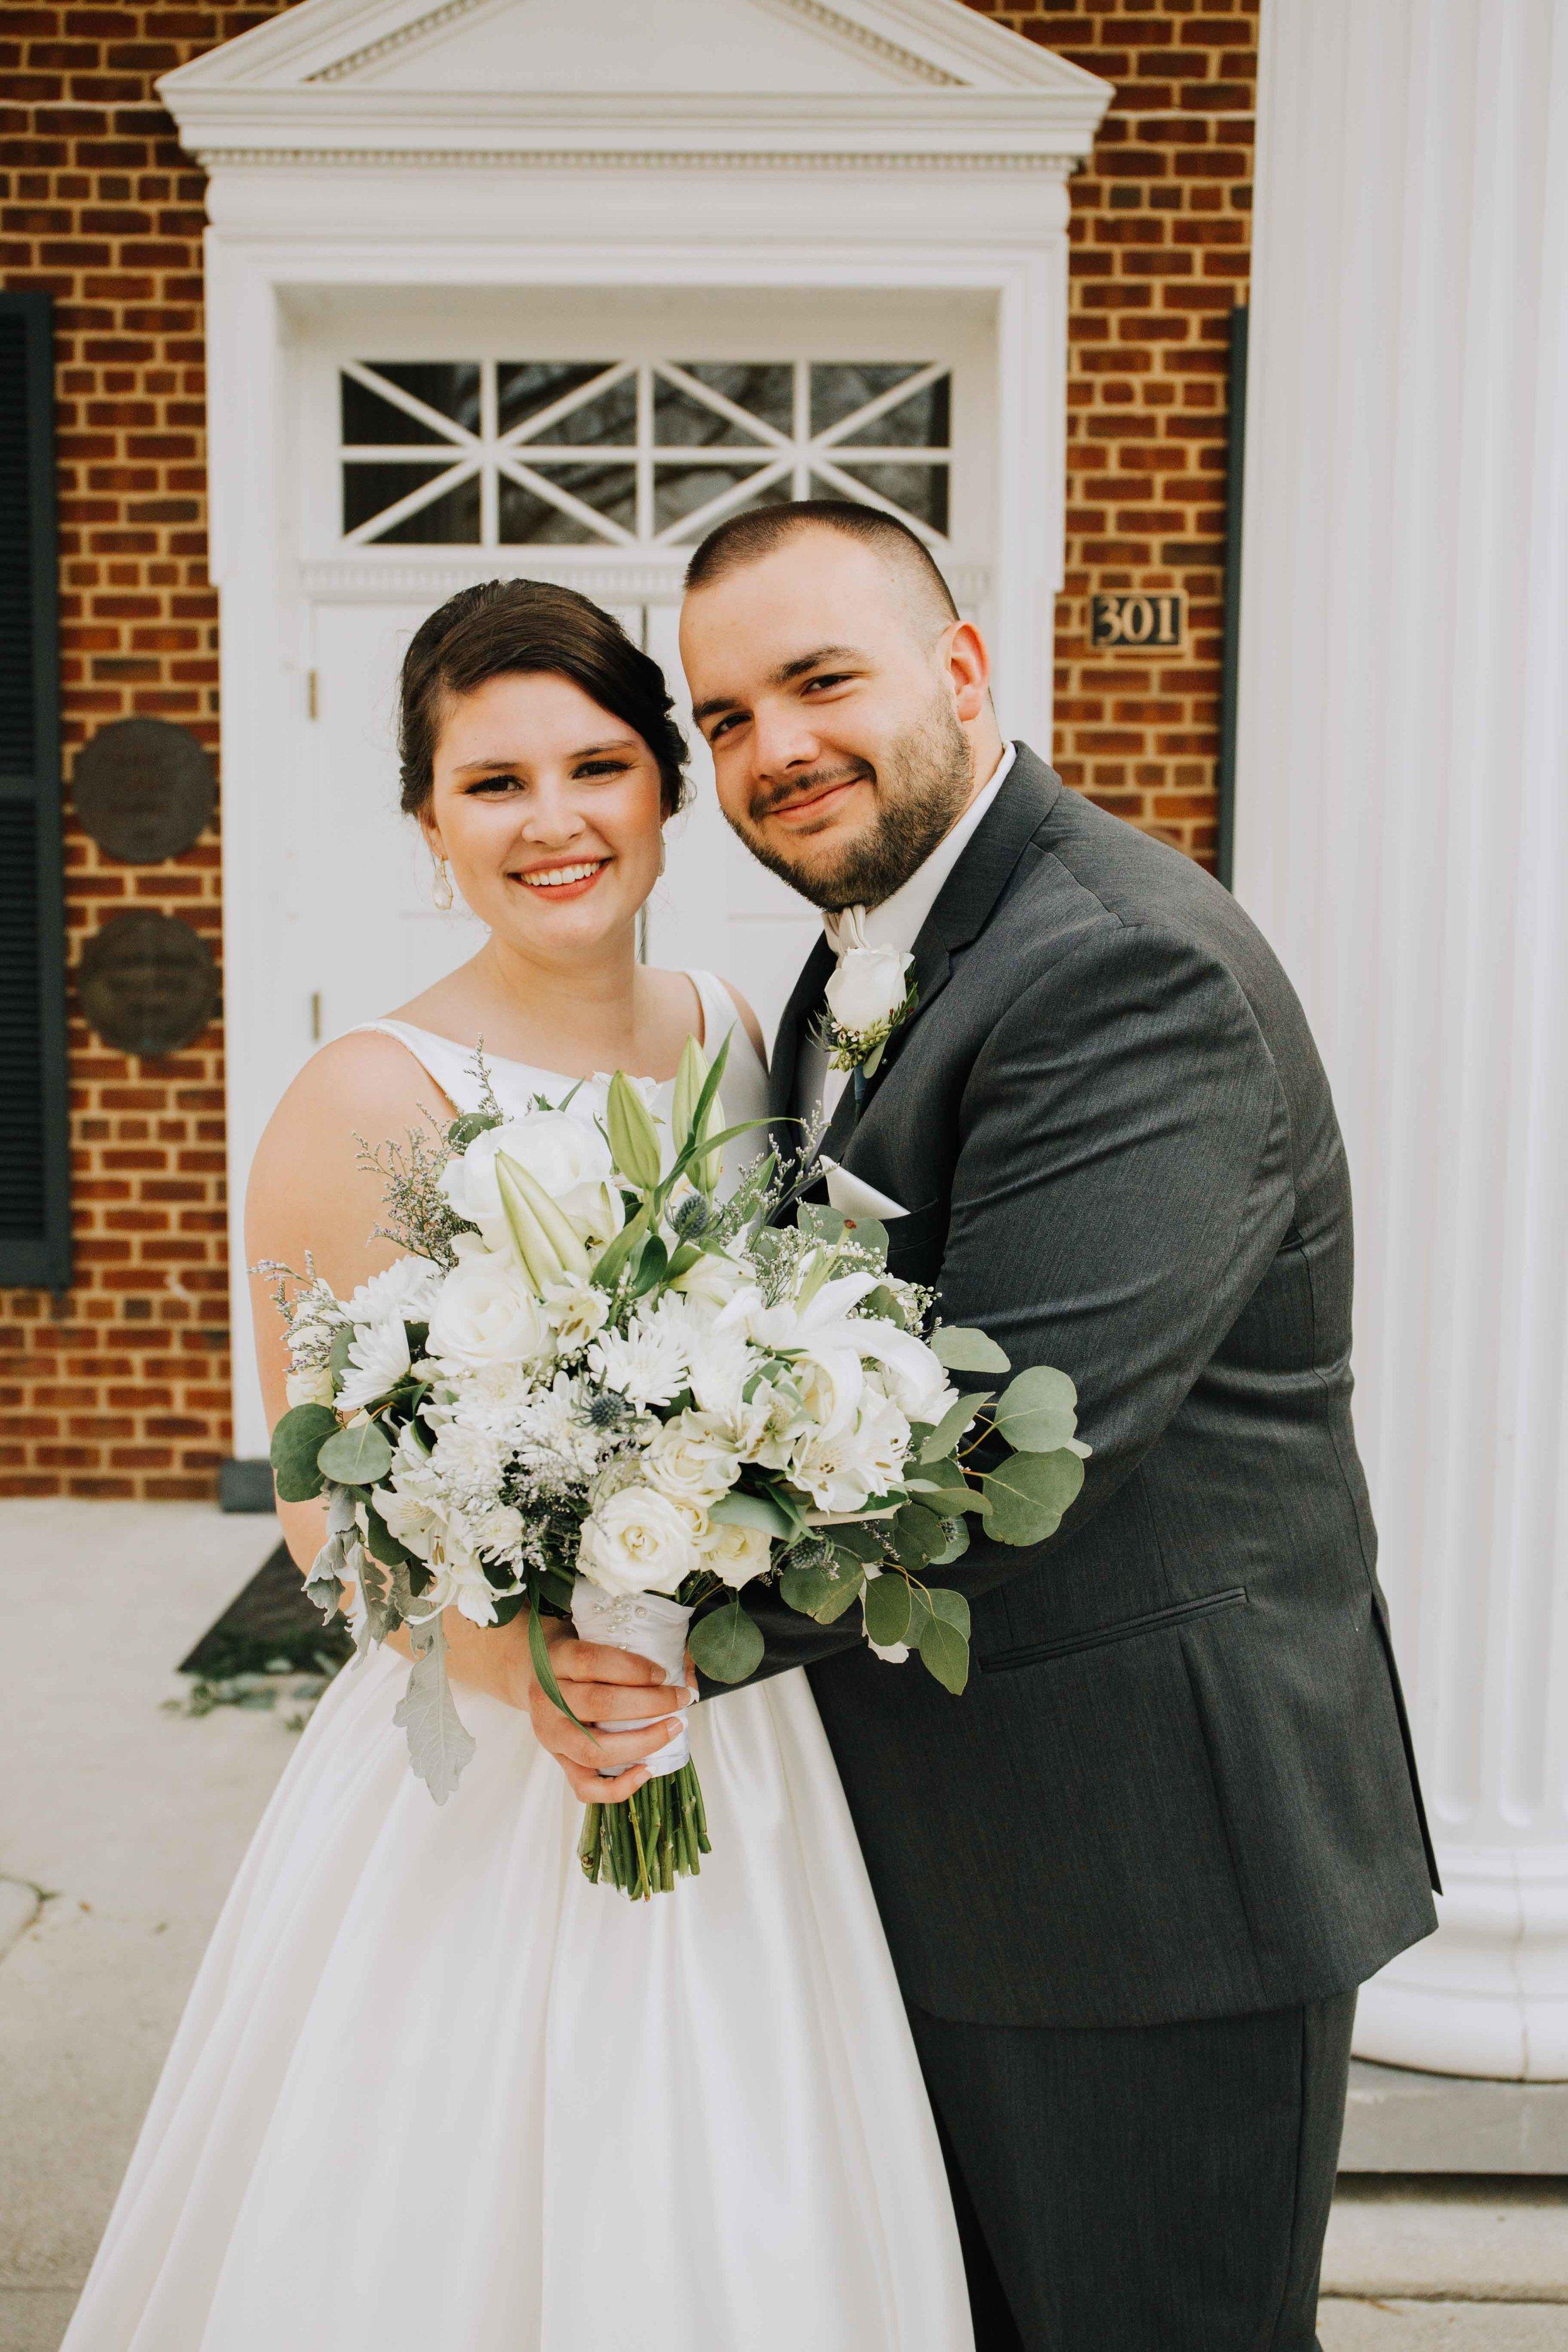 Farmville-Virginia-Wedding-Hotel-Weynoke-Downtown-Jacqueline-Waters-Photography-Detailed- (988).jpg